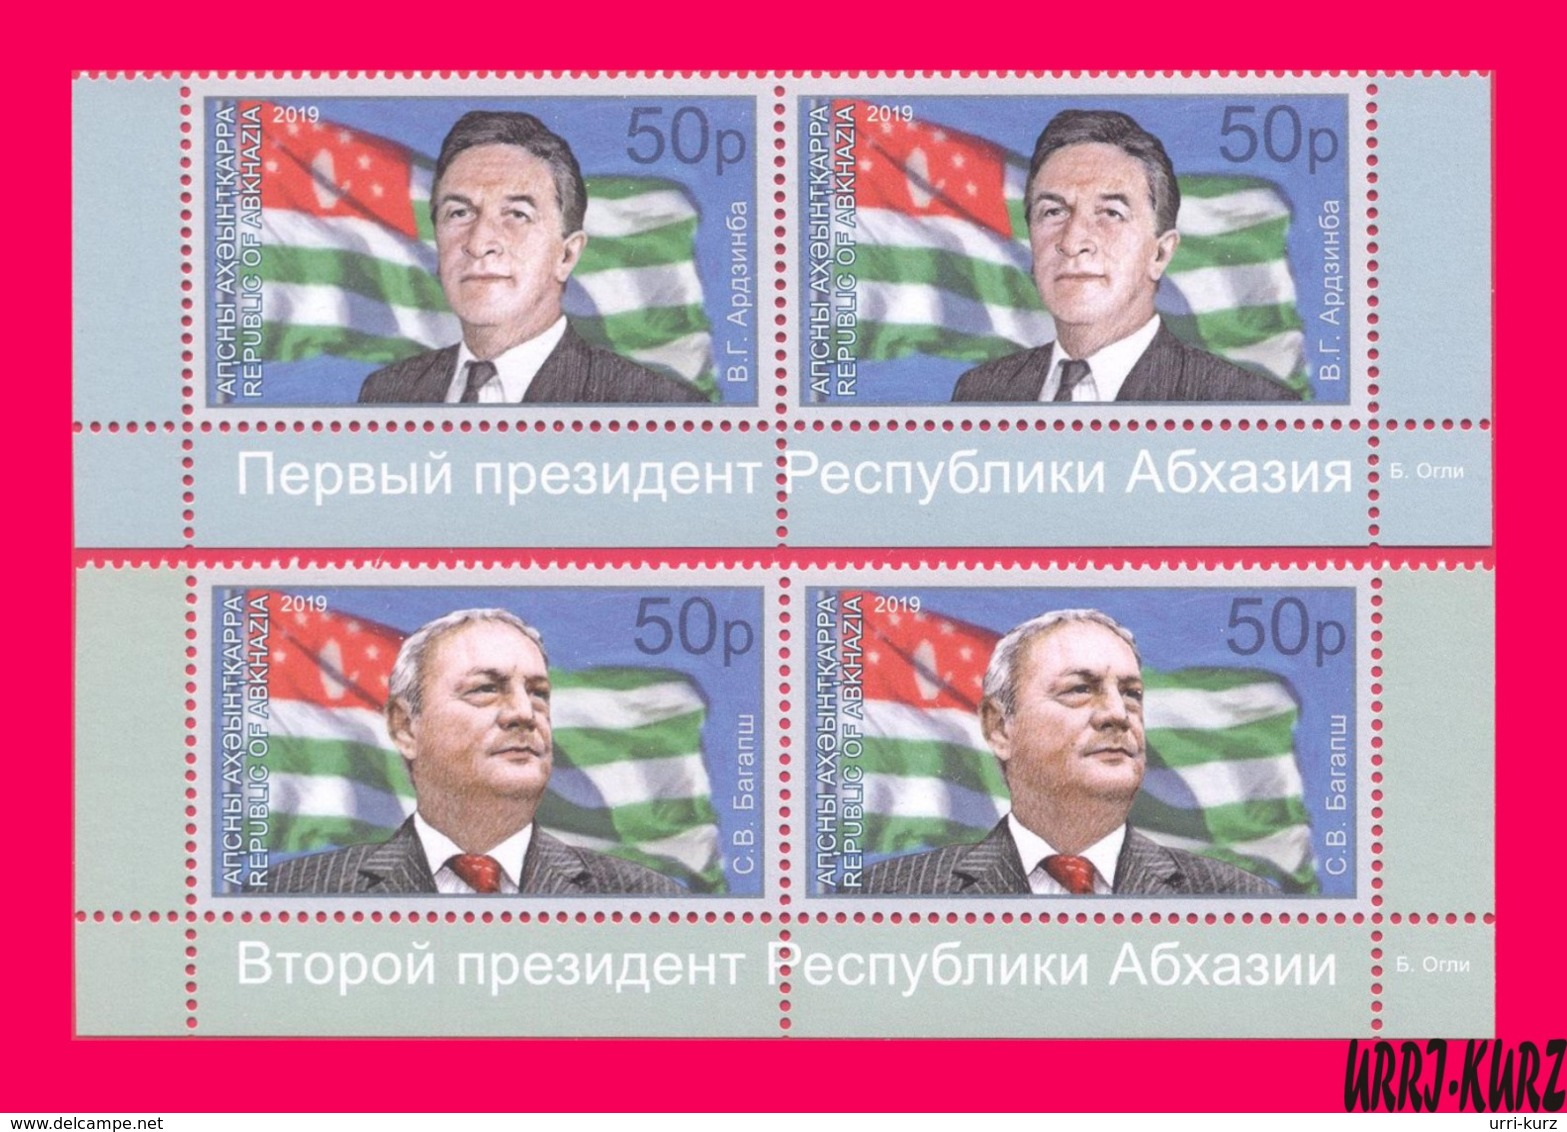 ABKHAZIA 2019 Famous People First Presidents Of Abkazia Vladislav Ardzinba & Sergei Bagapsh Background Flag 2 Pairs MNH - Stamps